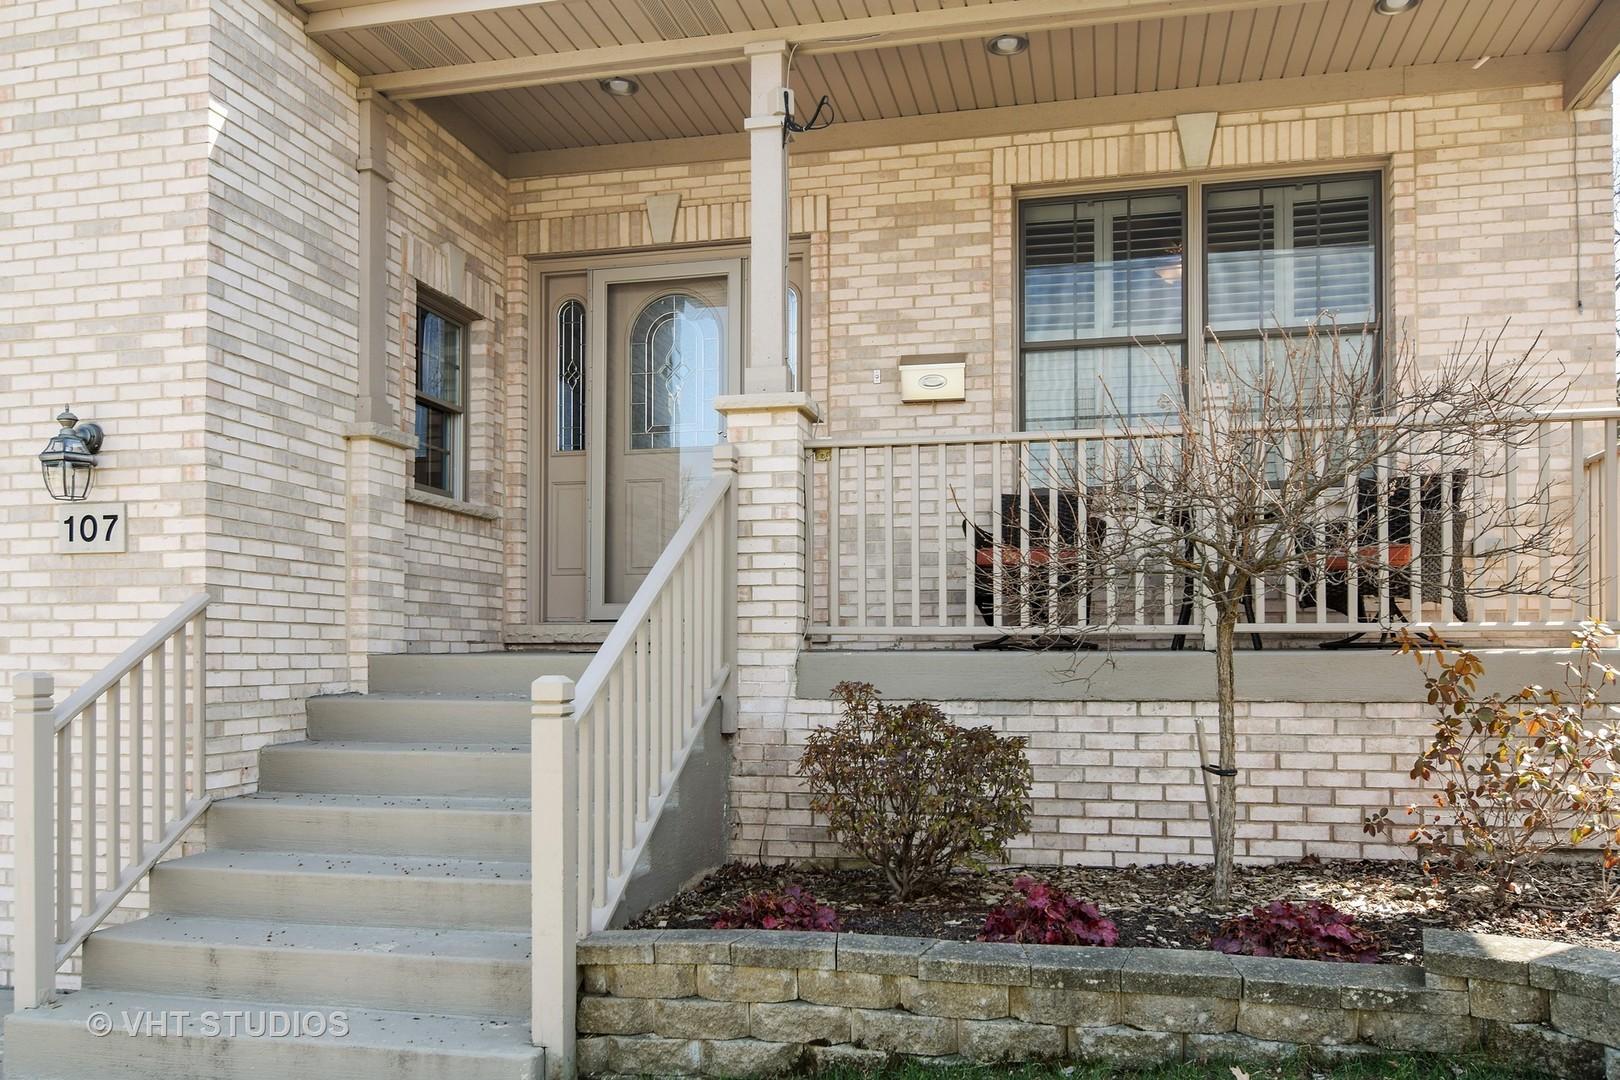 107 West Maple, ROSELLE, Illinois, 60172